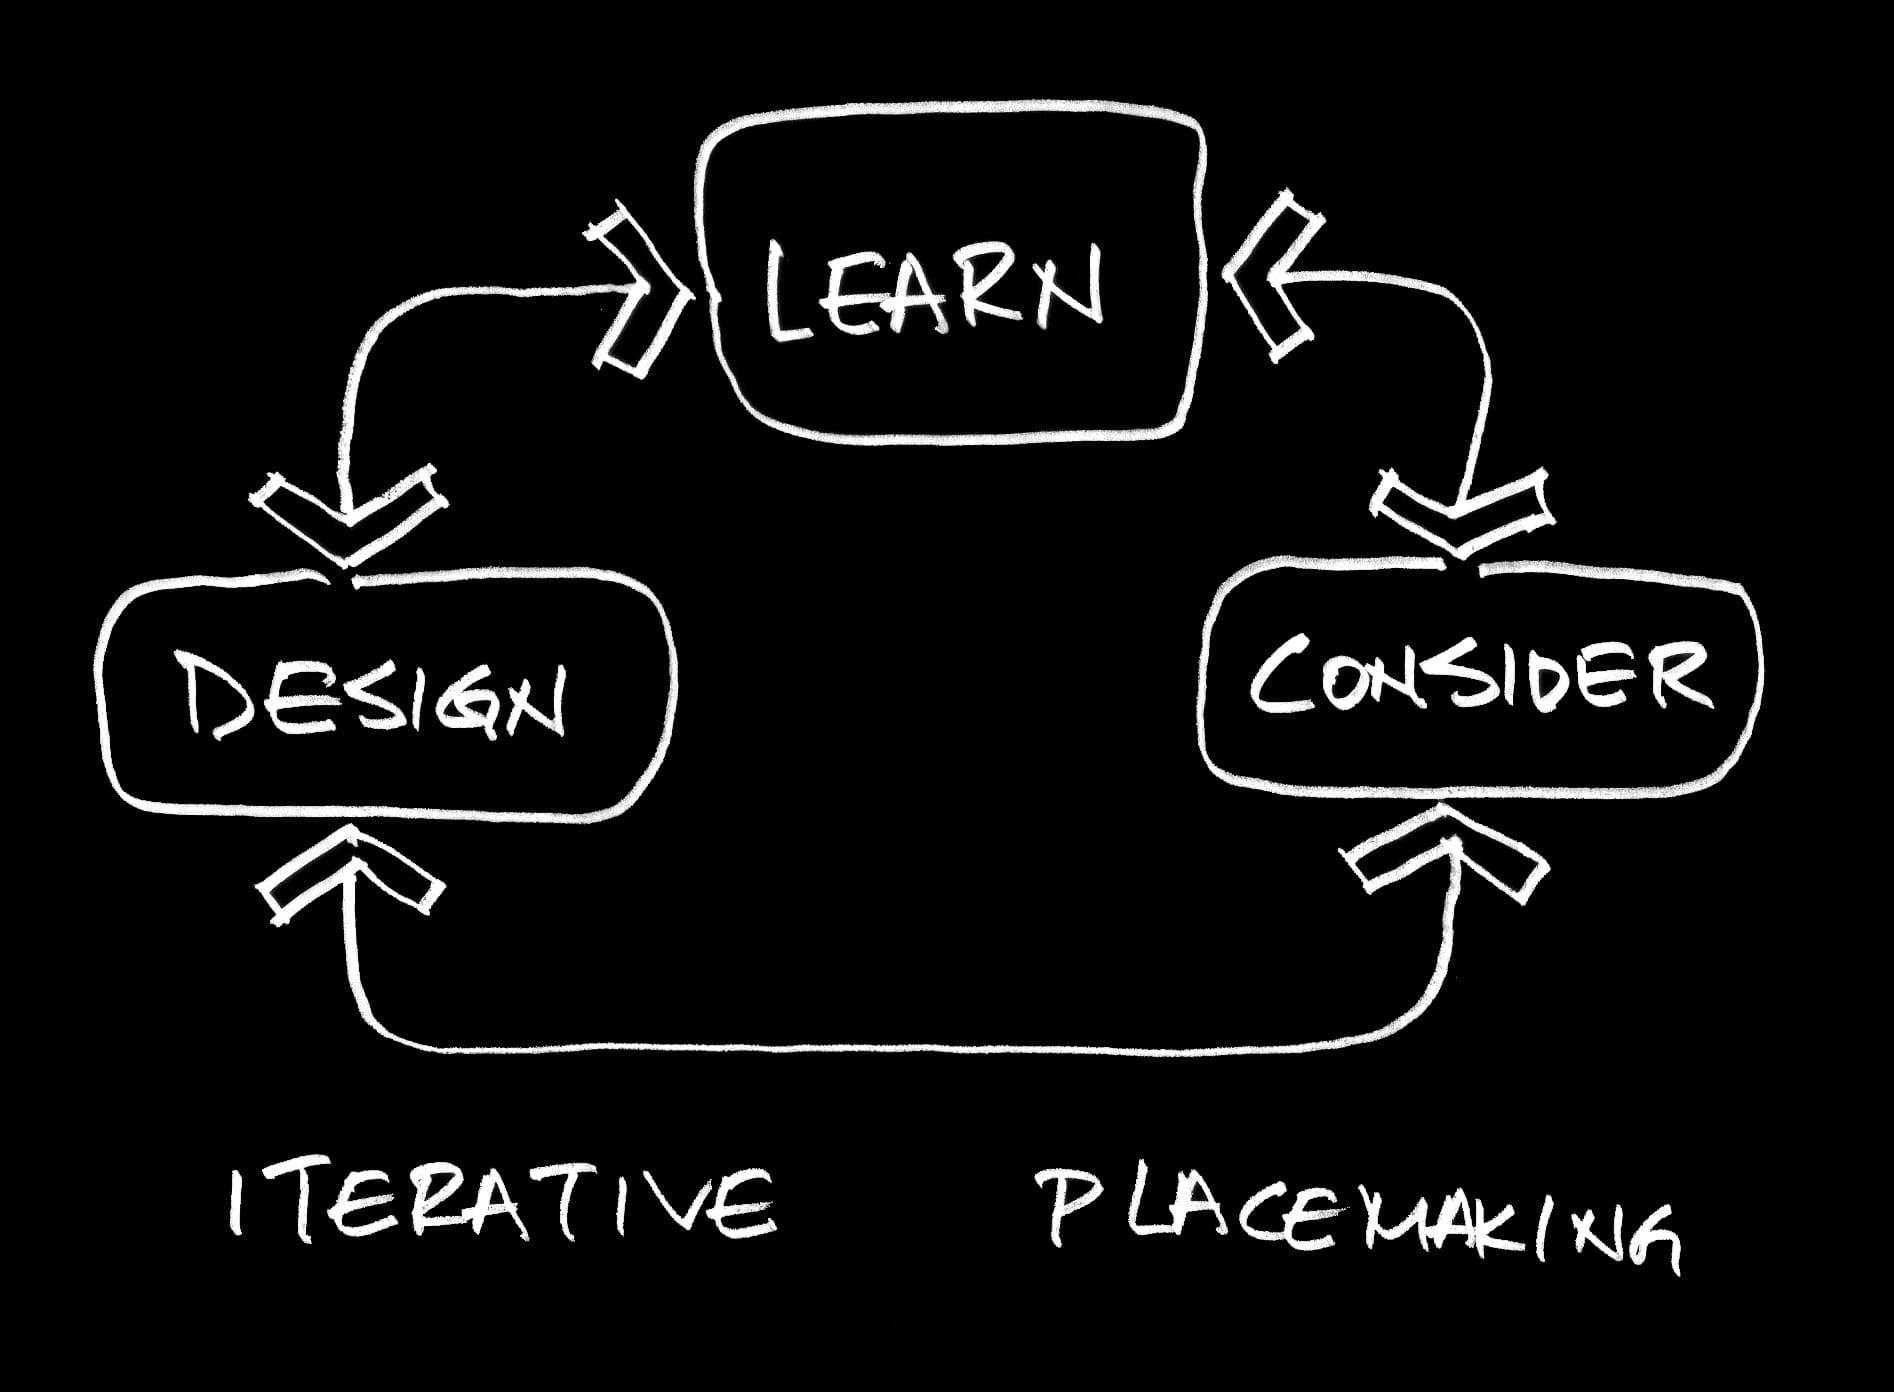 Masterplanning image.jpg